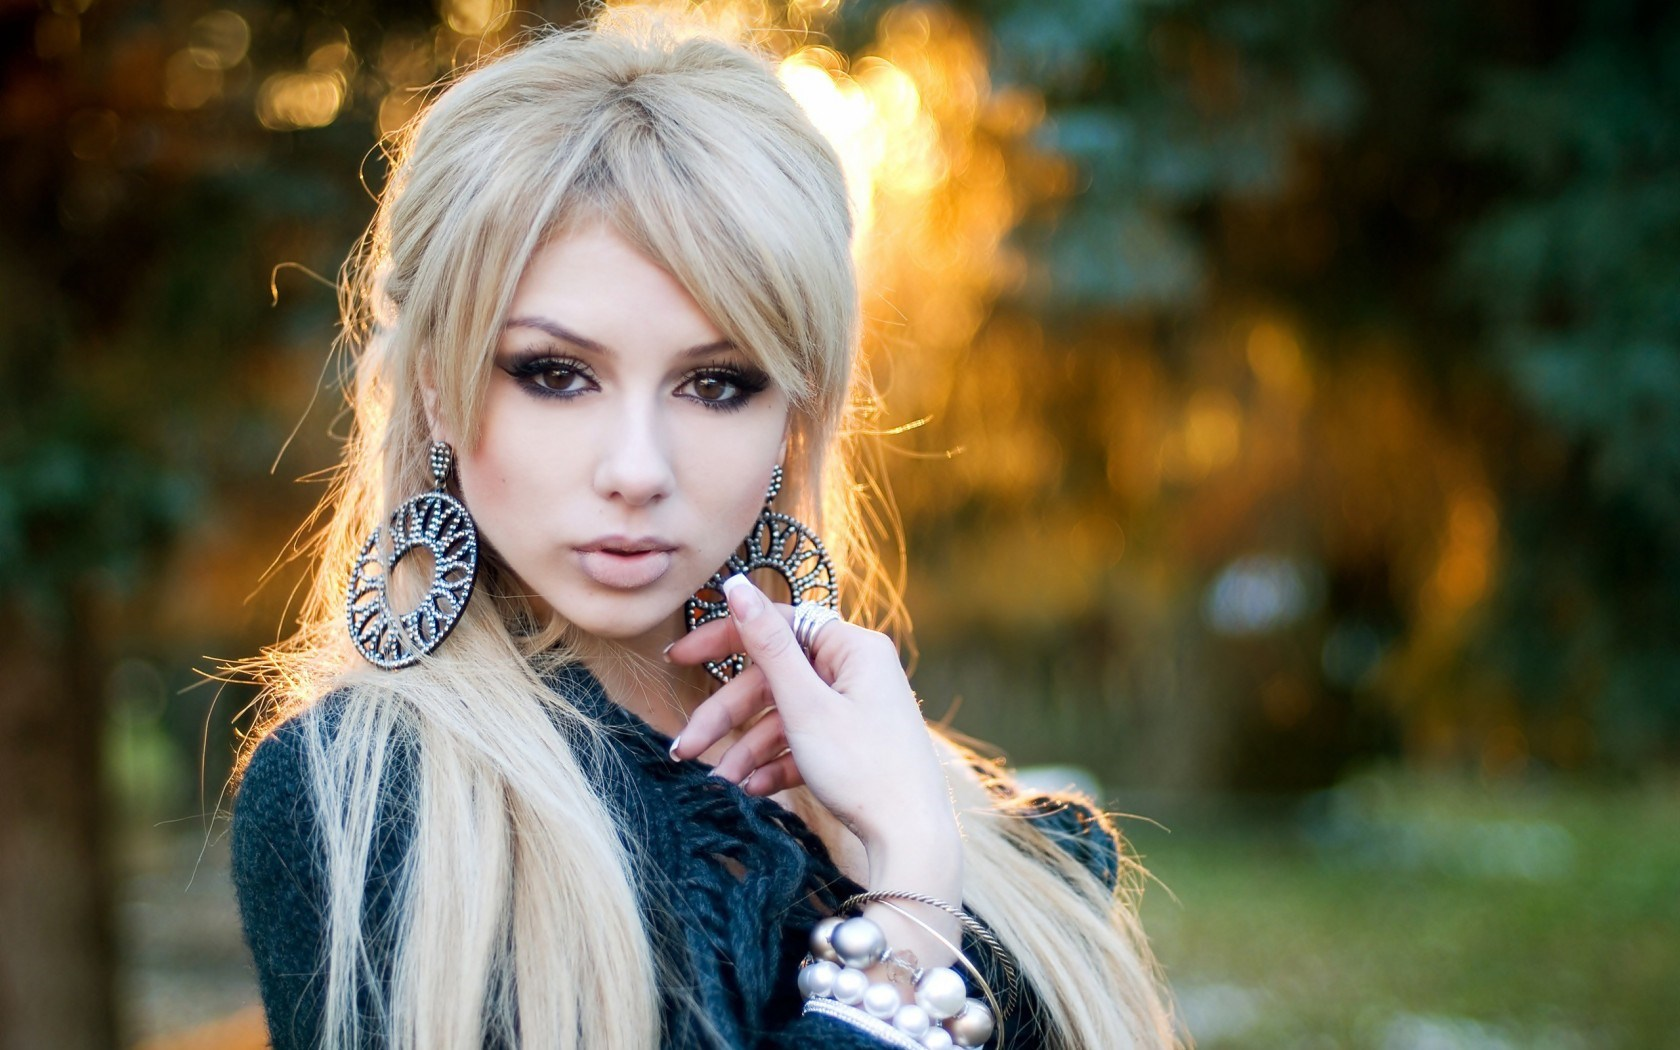 Glamour Blonde Girl Portrait